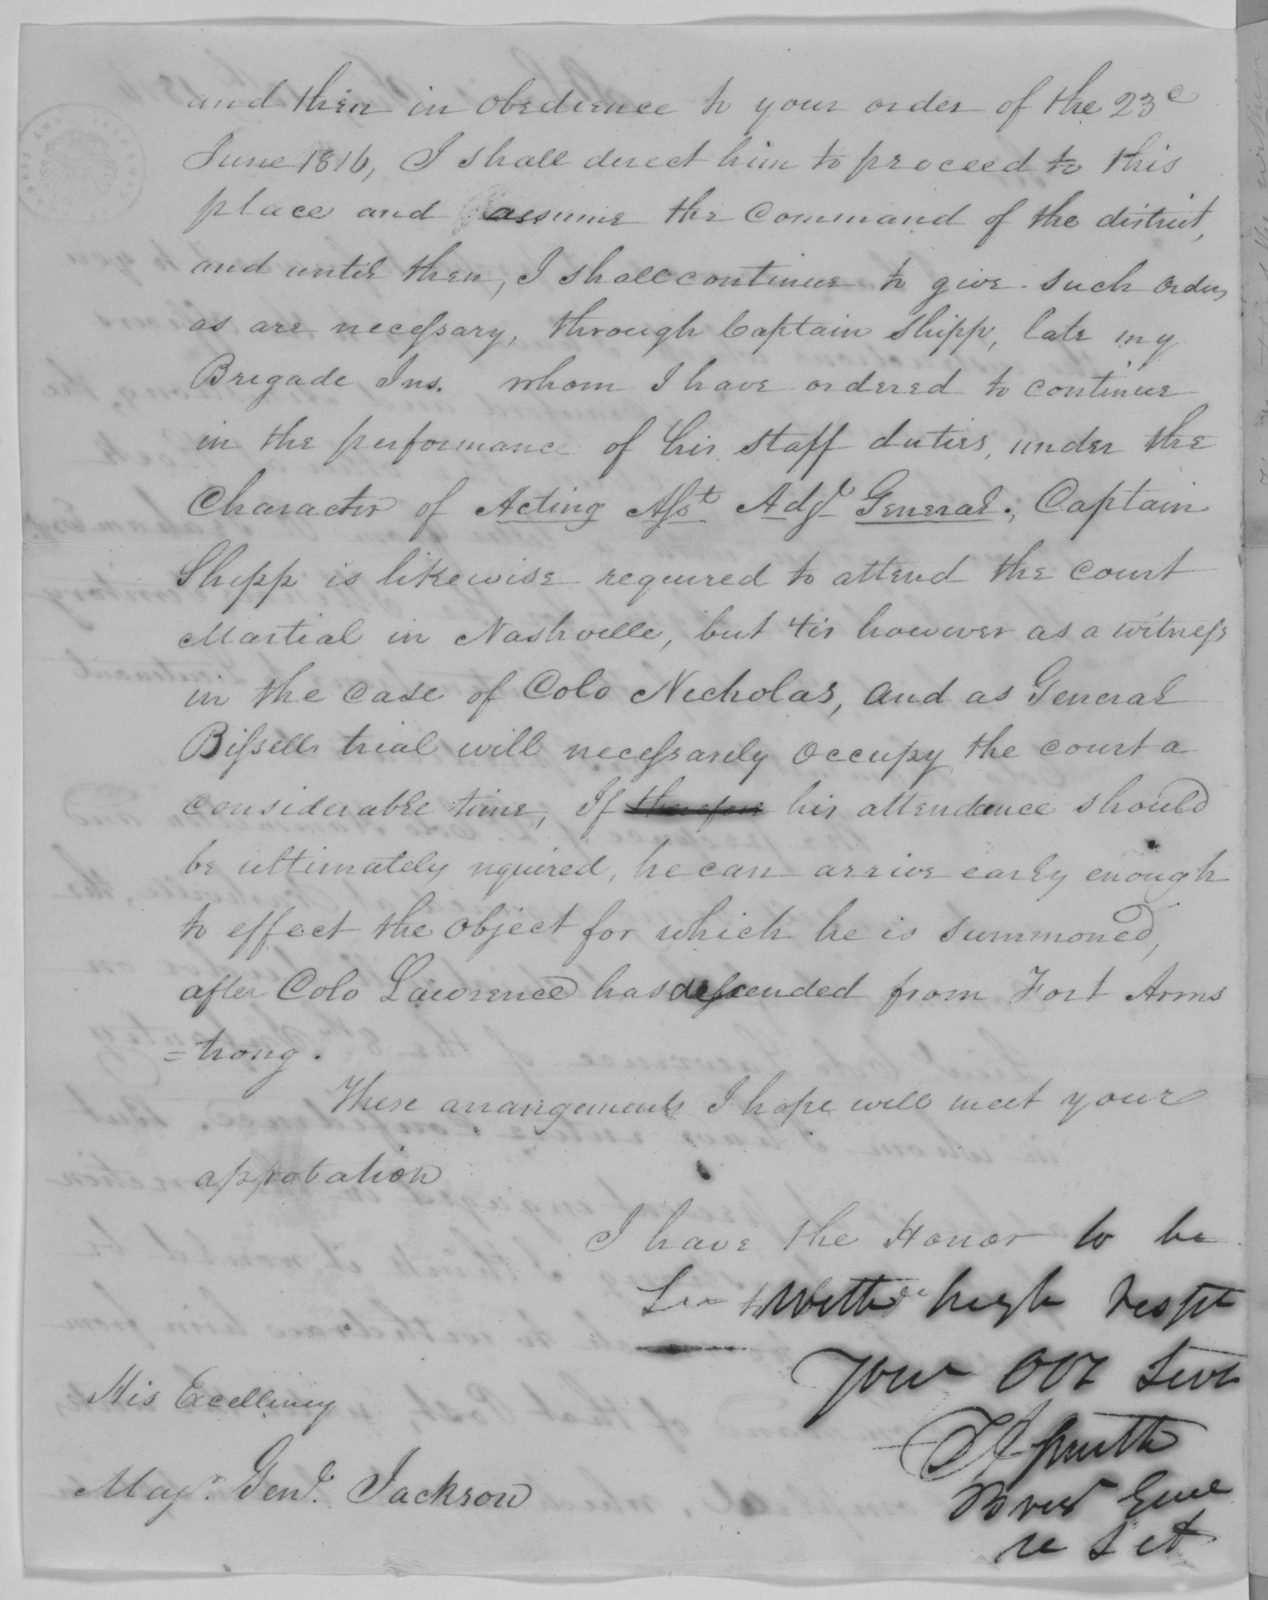 Thomas Adams Smith to Andrew Jackson, July 13, 1816